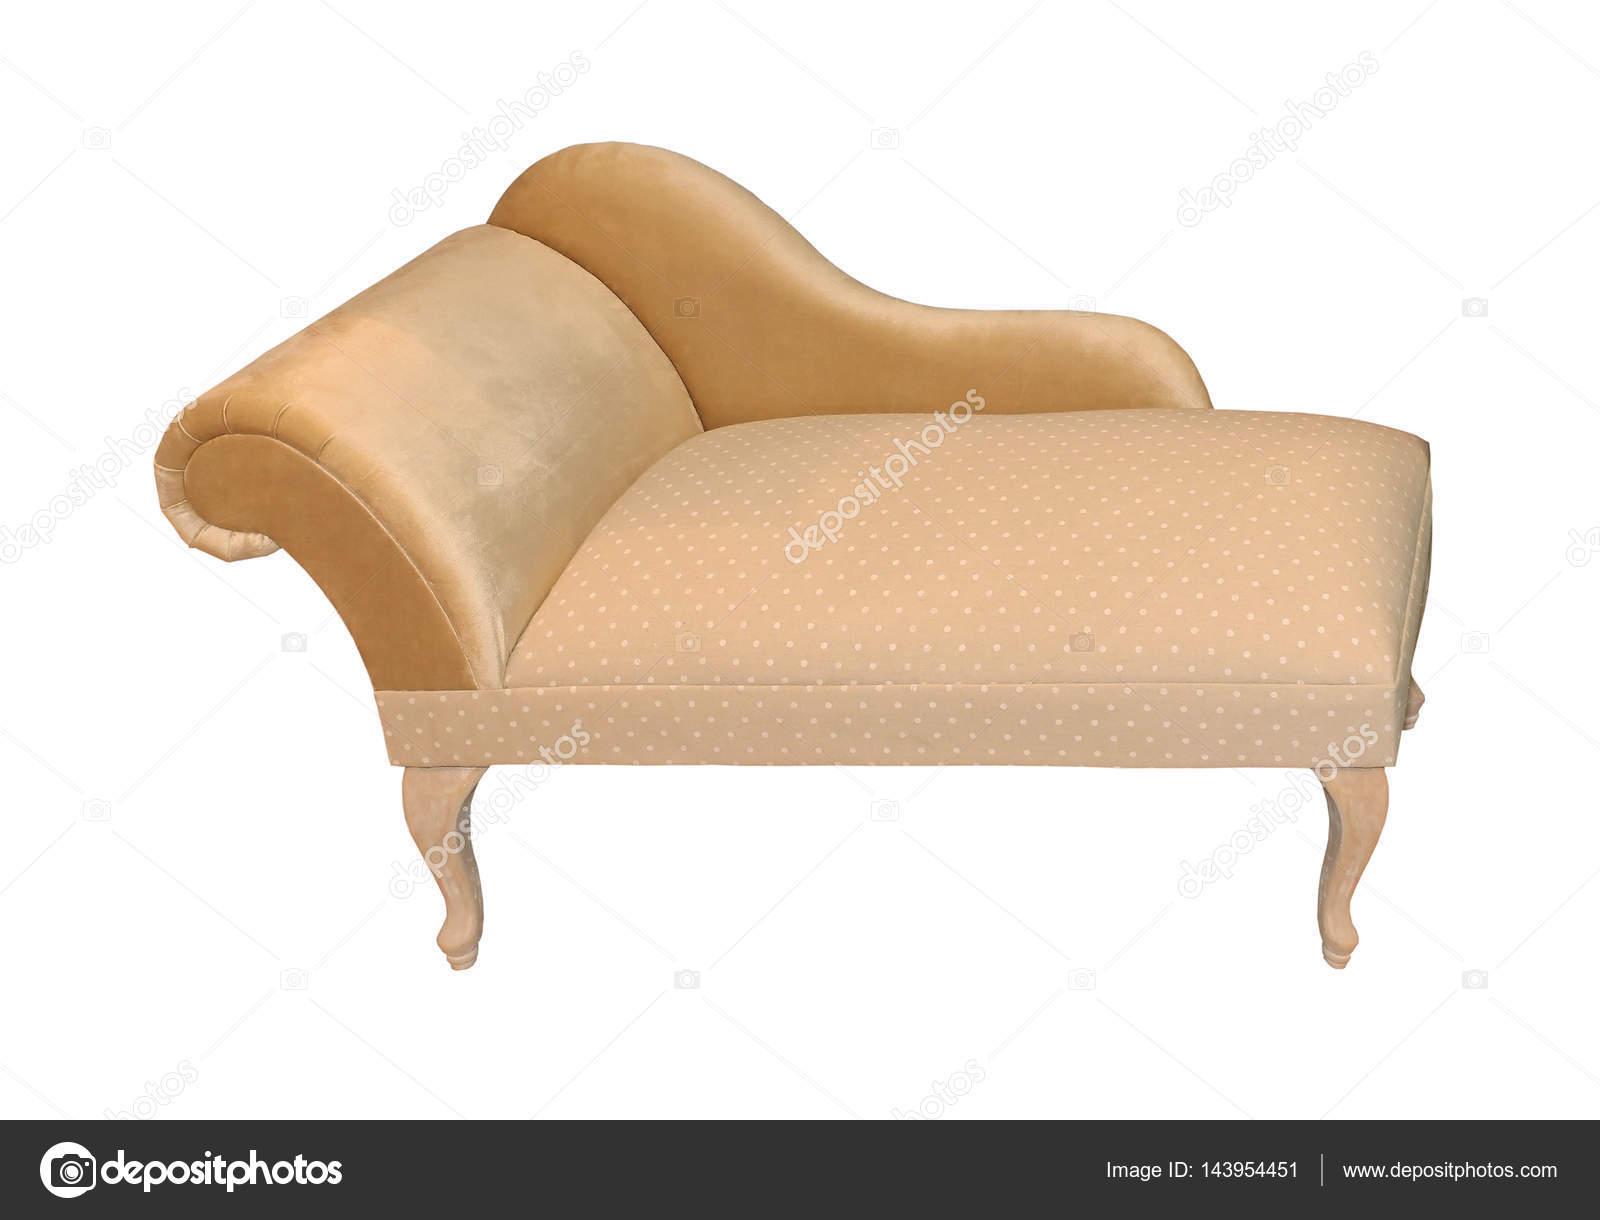 Retro chaise longue — Stock Photo © ttatty #143954451 on chaise furniture, chaise sofa sleeper, chaise recliner chair,